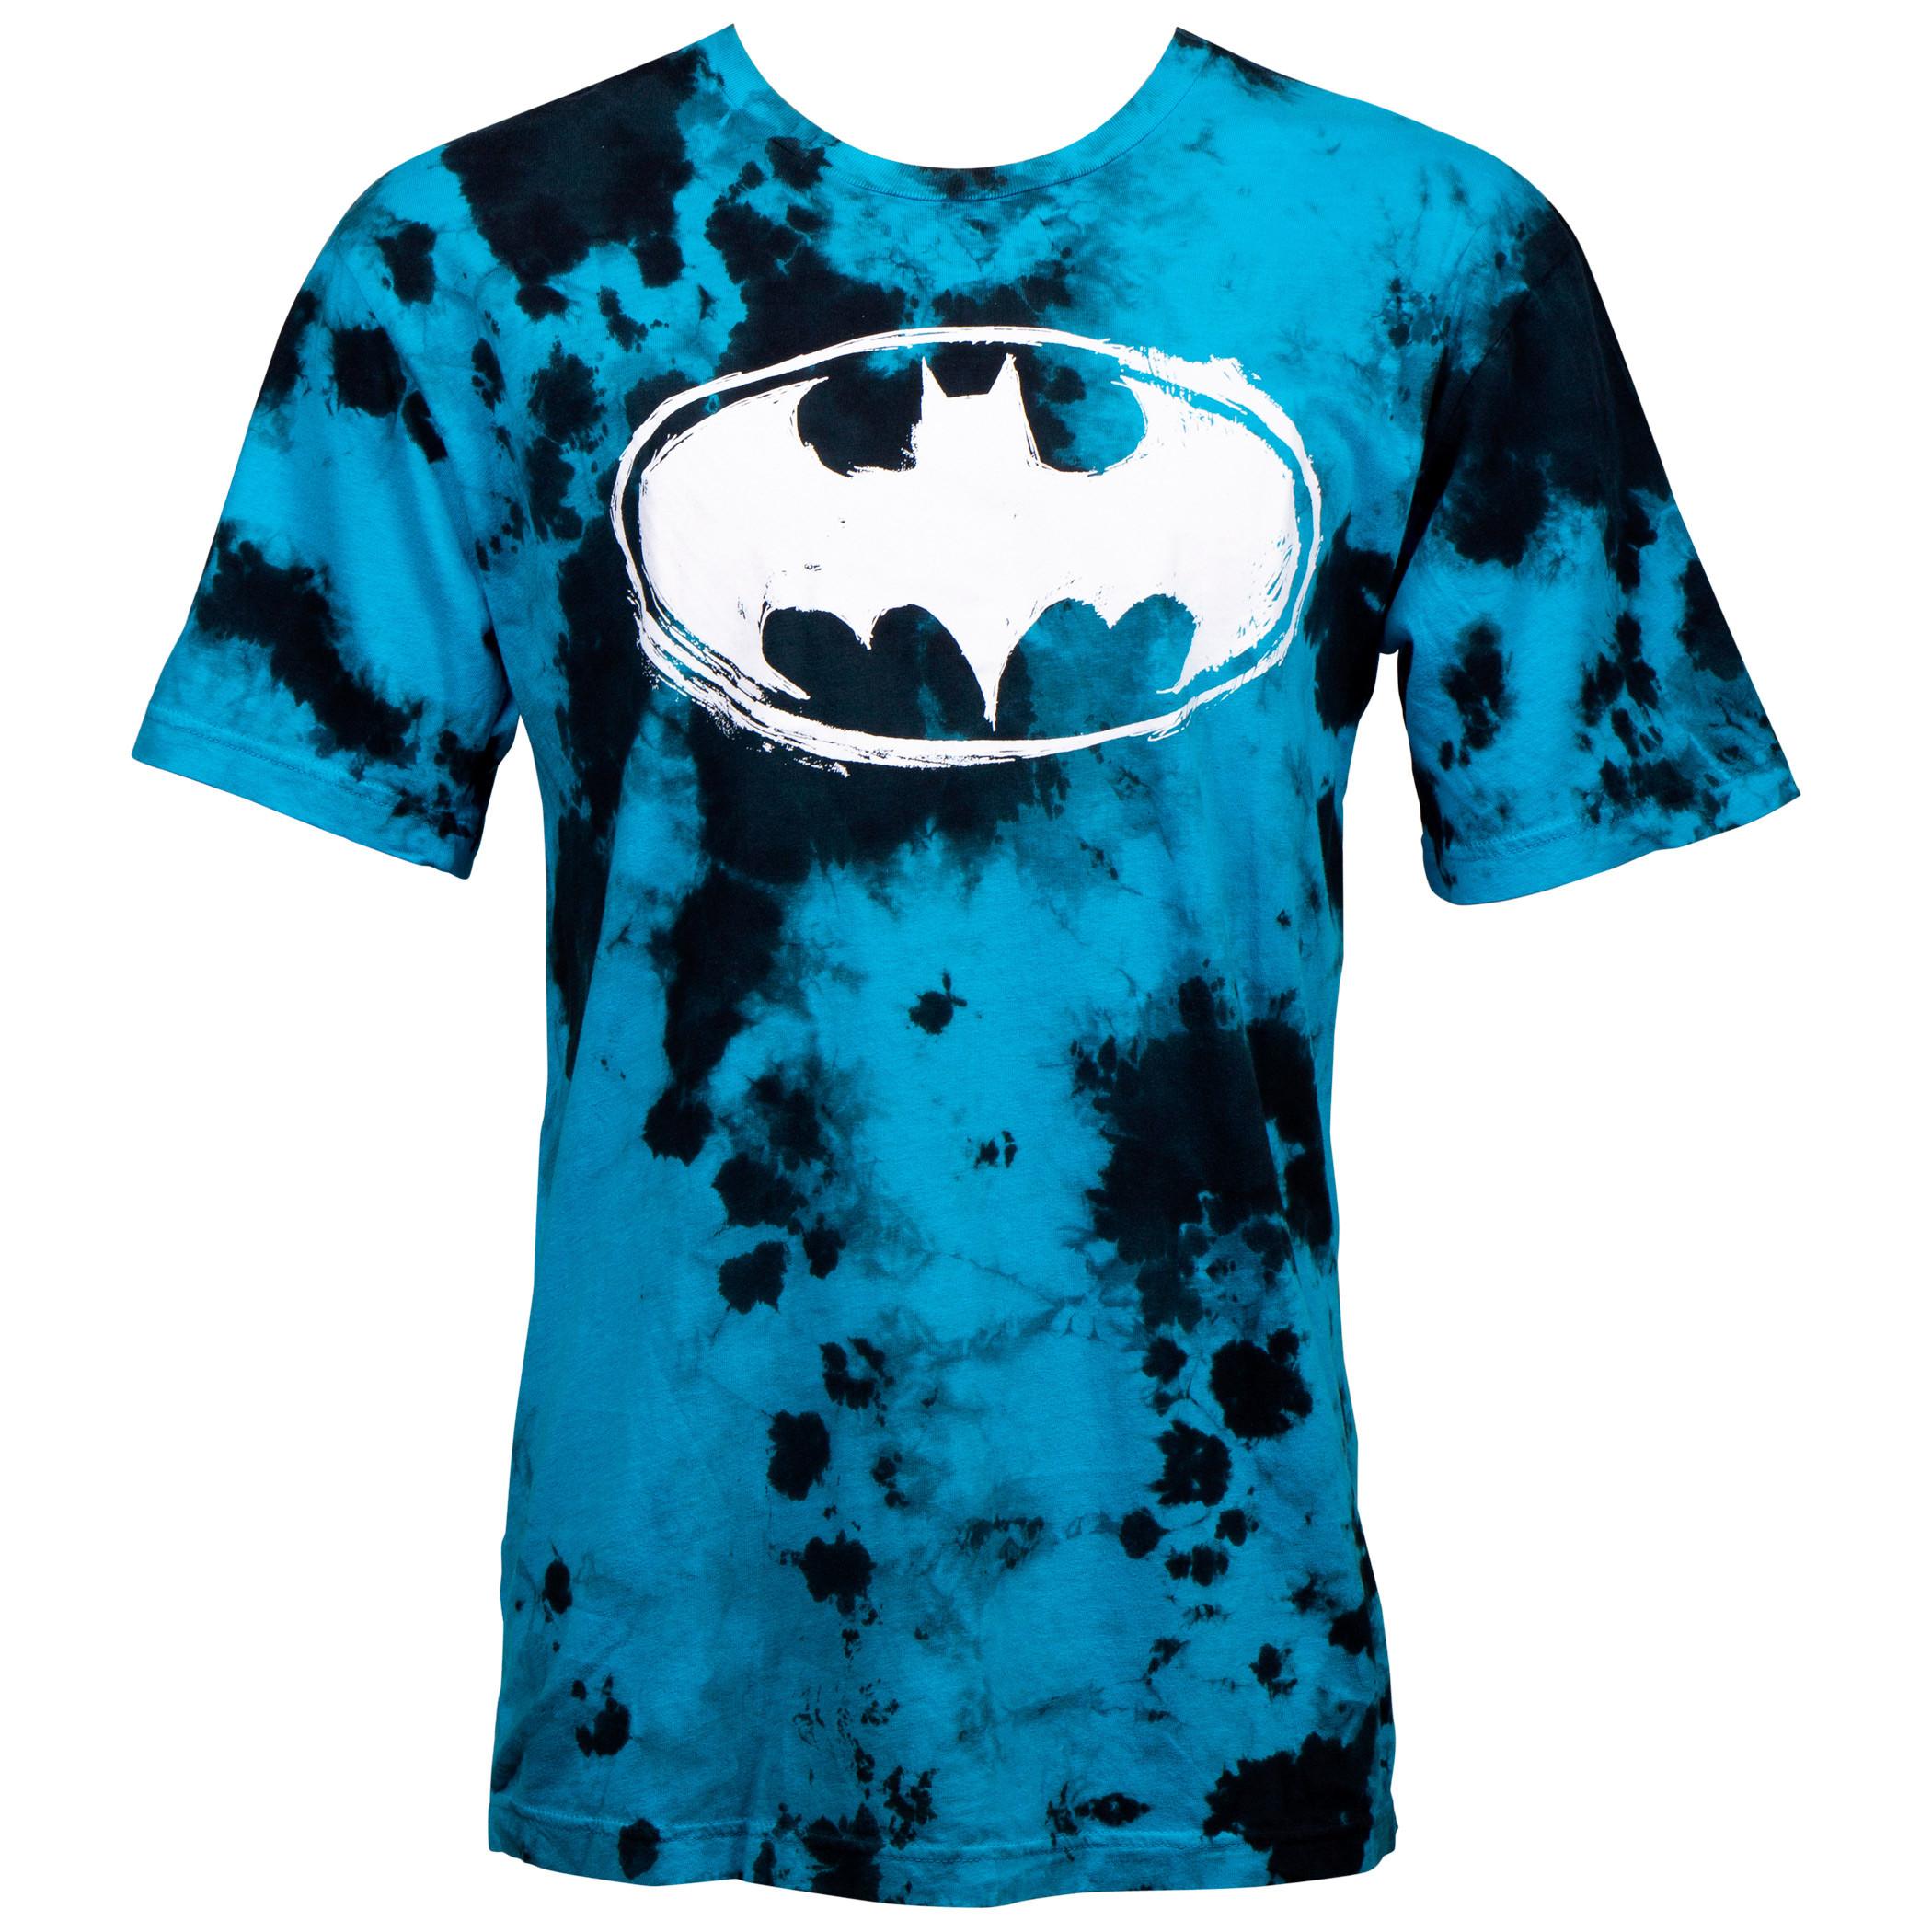 Batman Turquoise Cloud Blotch Dye T-Shirt